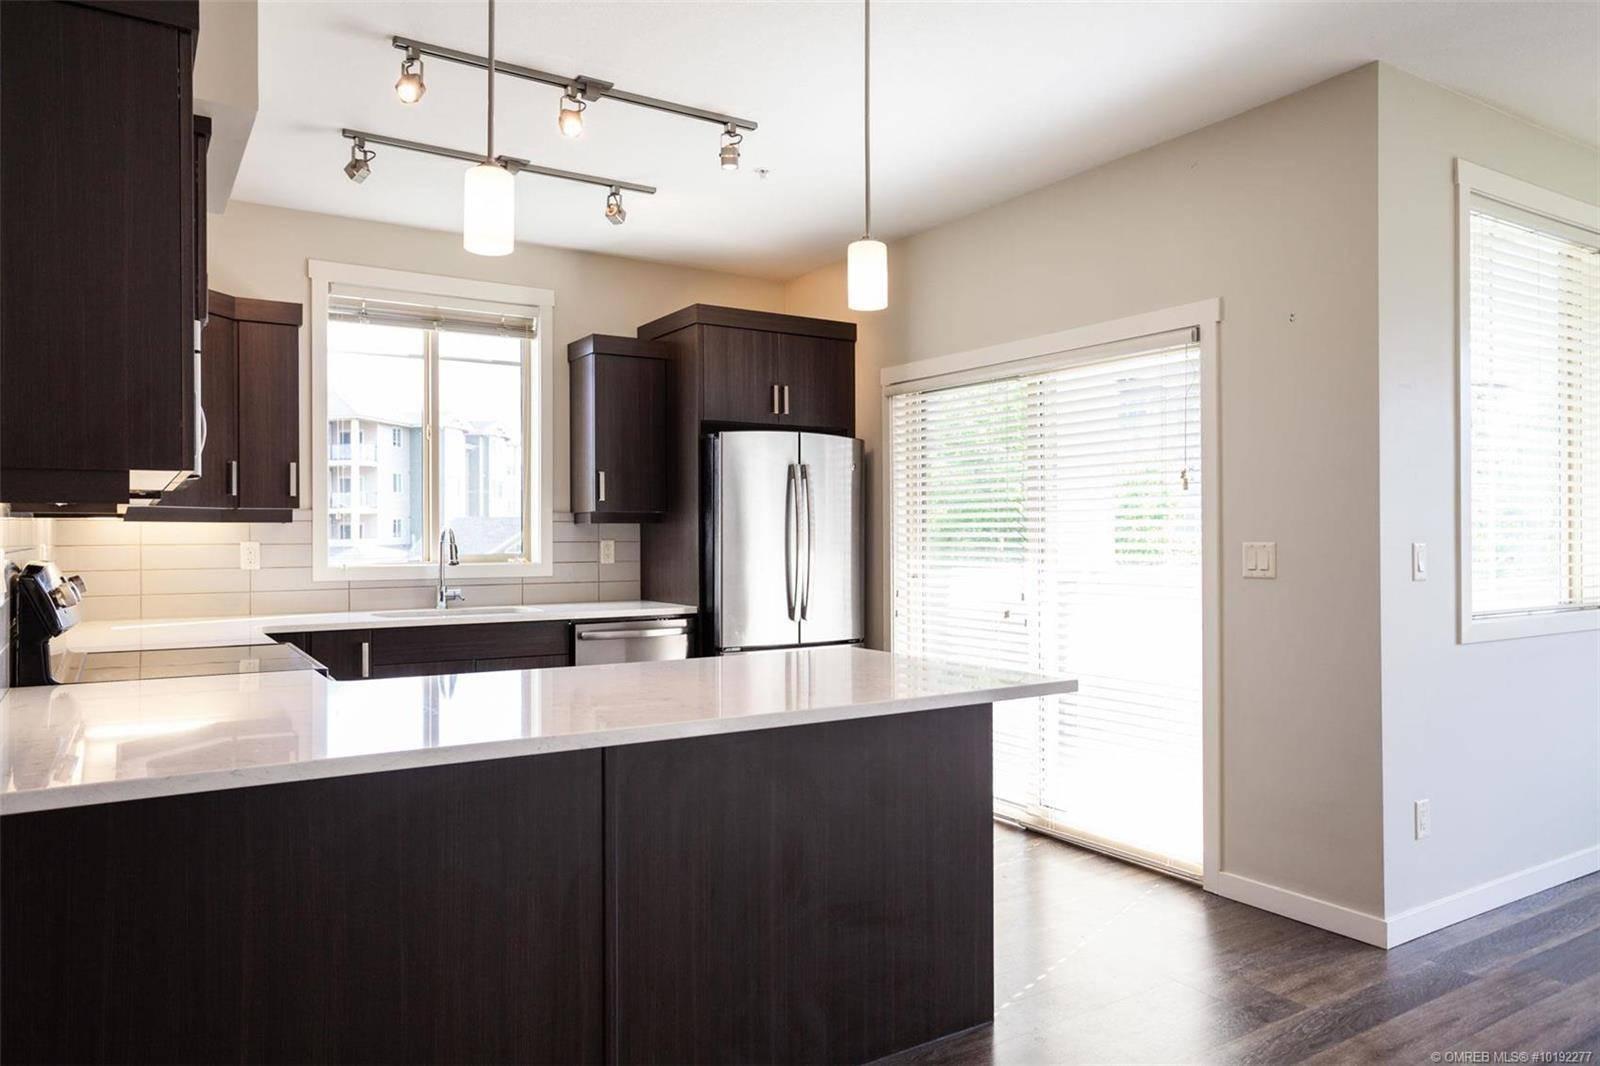 Condo for sale at 3731 Casorso Rd Unit 213 Kelowna British Columbia - MLS: 10192277